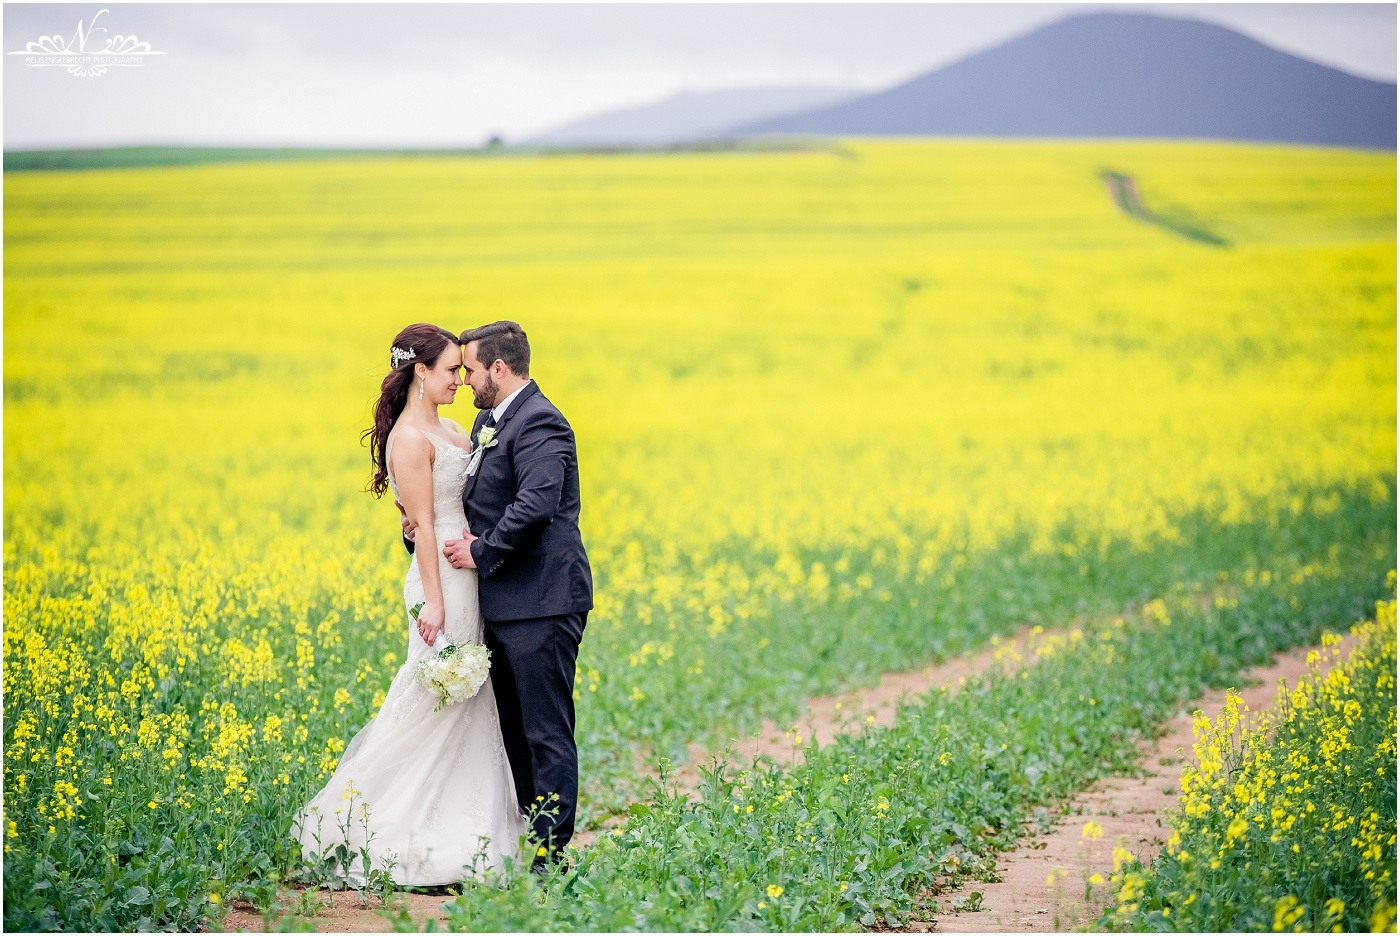 Eensgezind-Wedding-Photos-Nelis-Engelbrecht-Photography-129